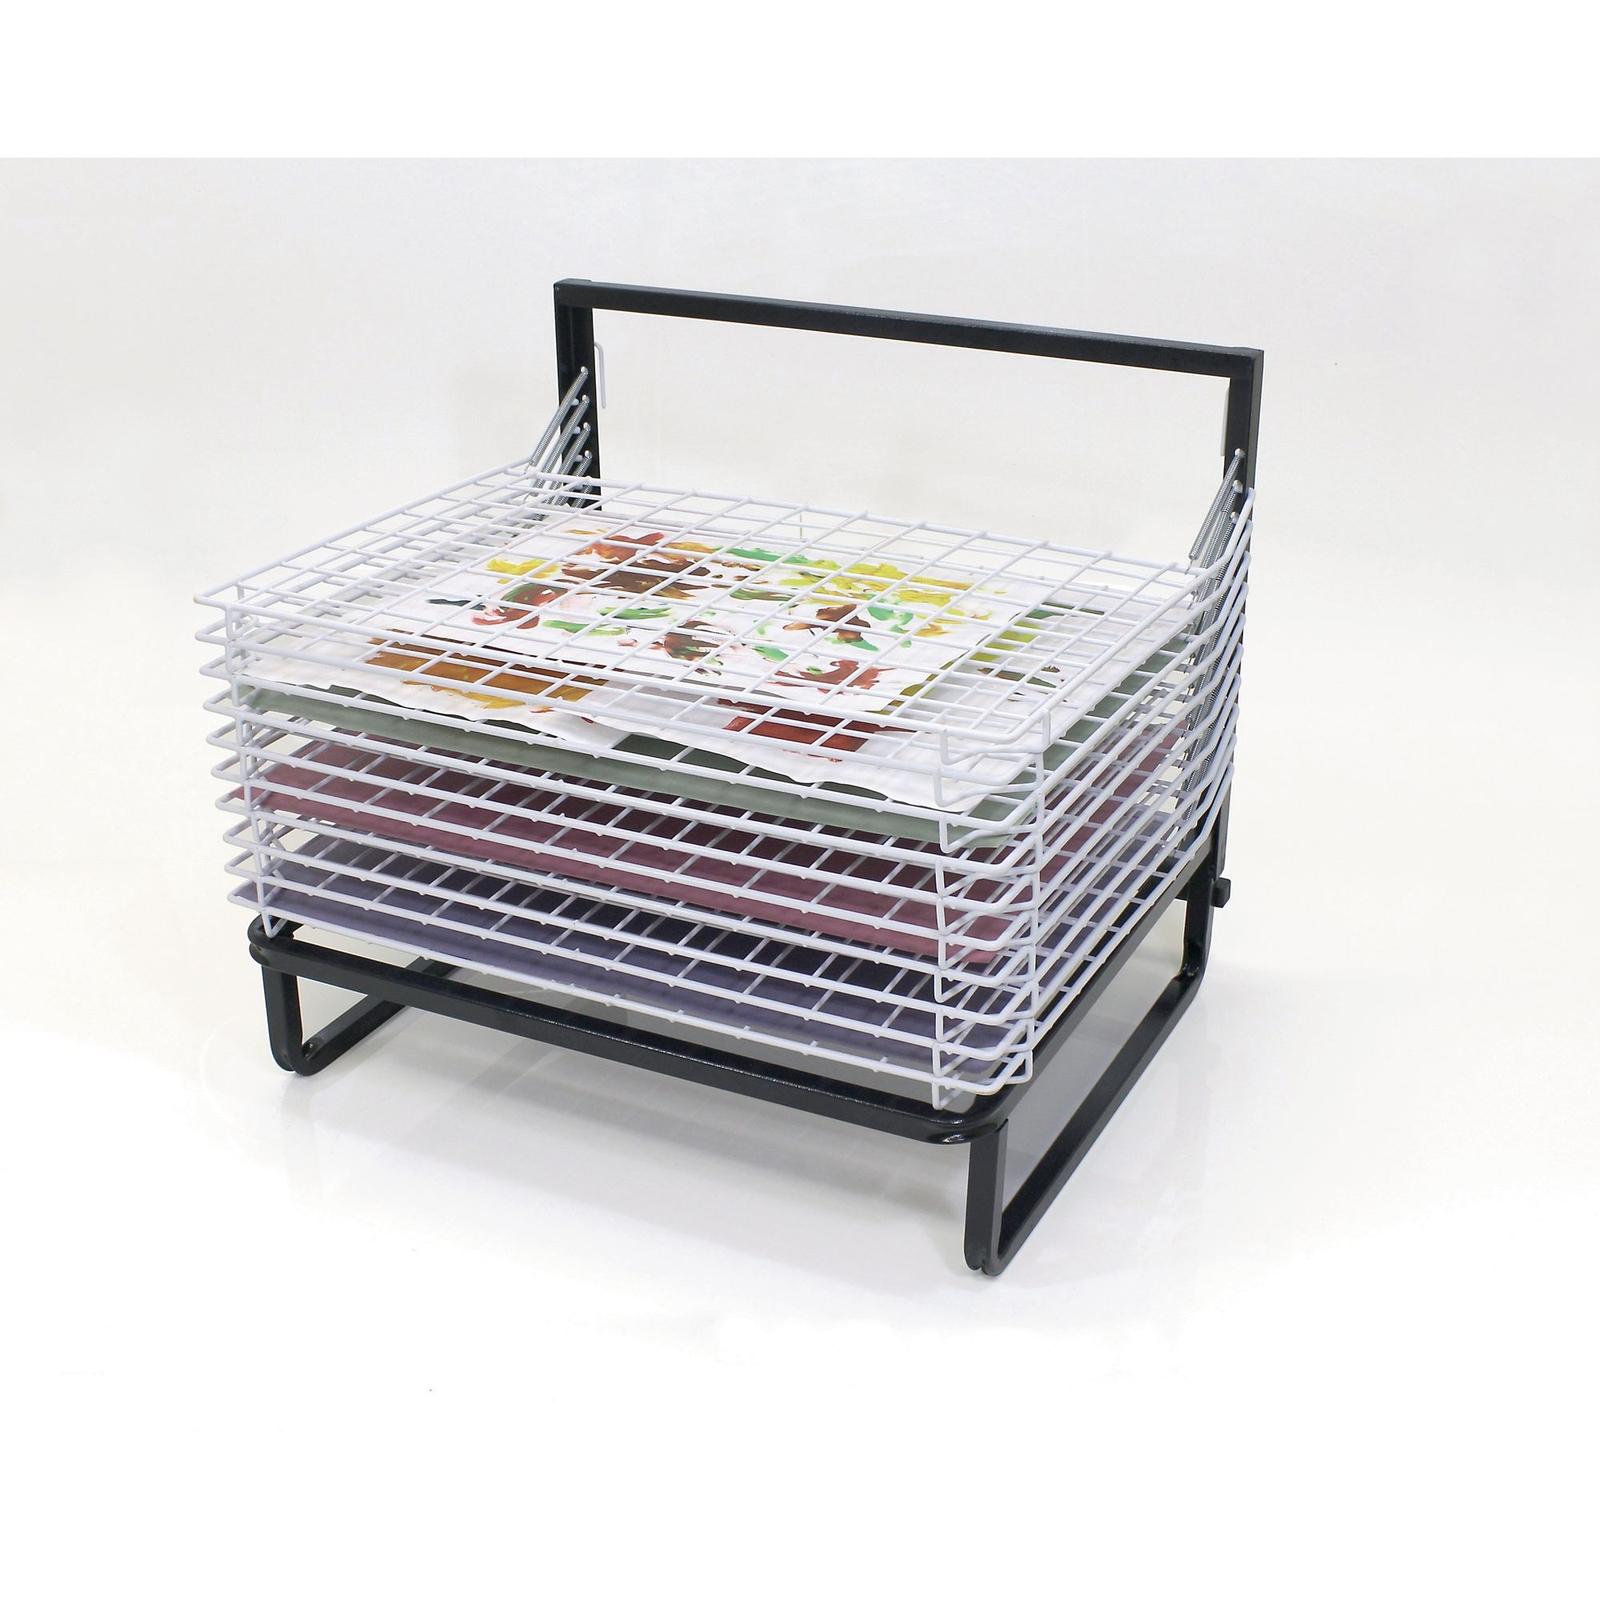 Spring Loaded Dryers - 10 Shelf